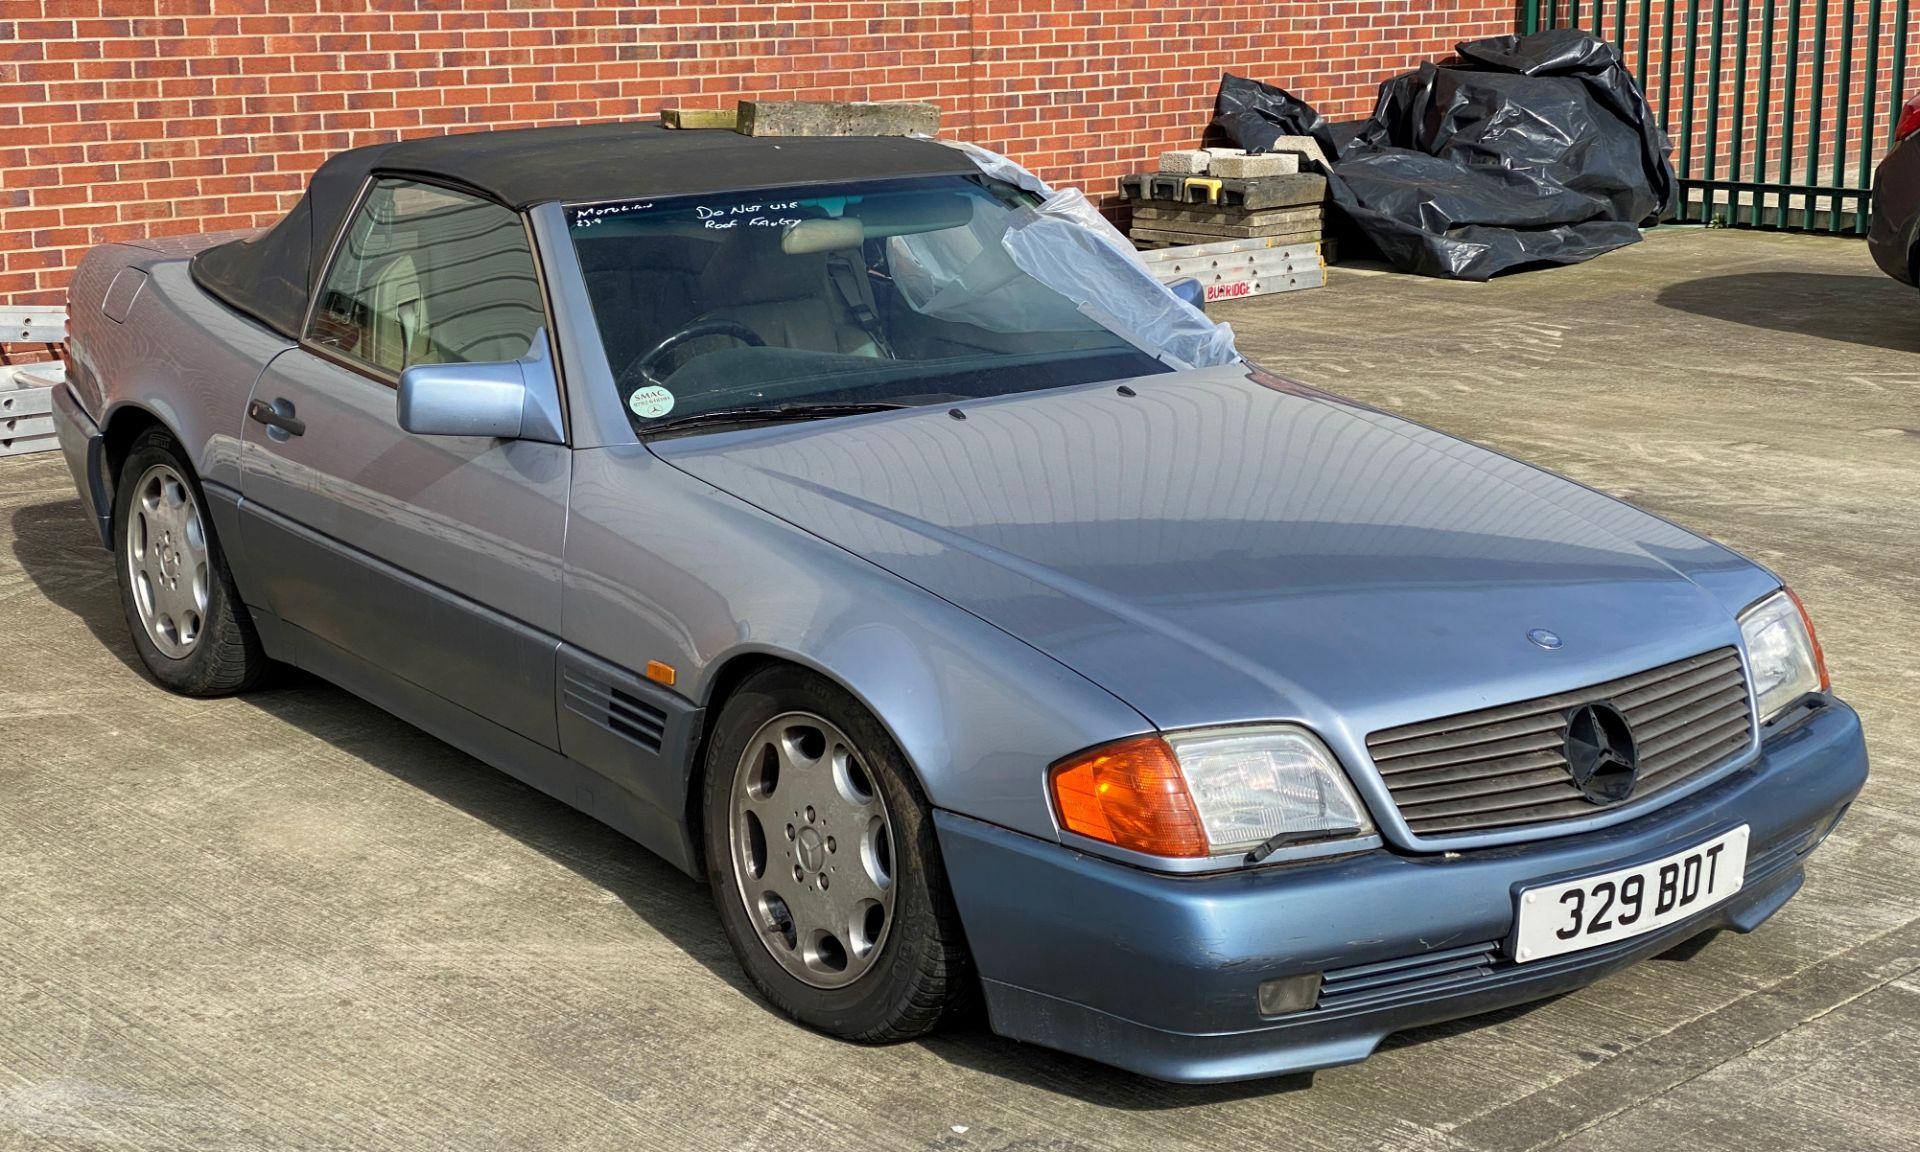 Lot 2 - MERCEDES 500SL-32 AUTOMATIC CONVERTIBLE (4973CC) - Petrol - Blue - Cream leather interior Reg No: